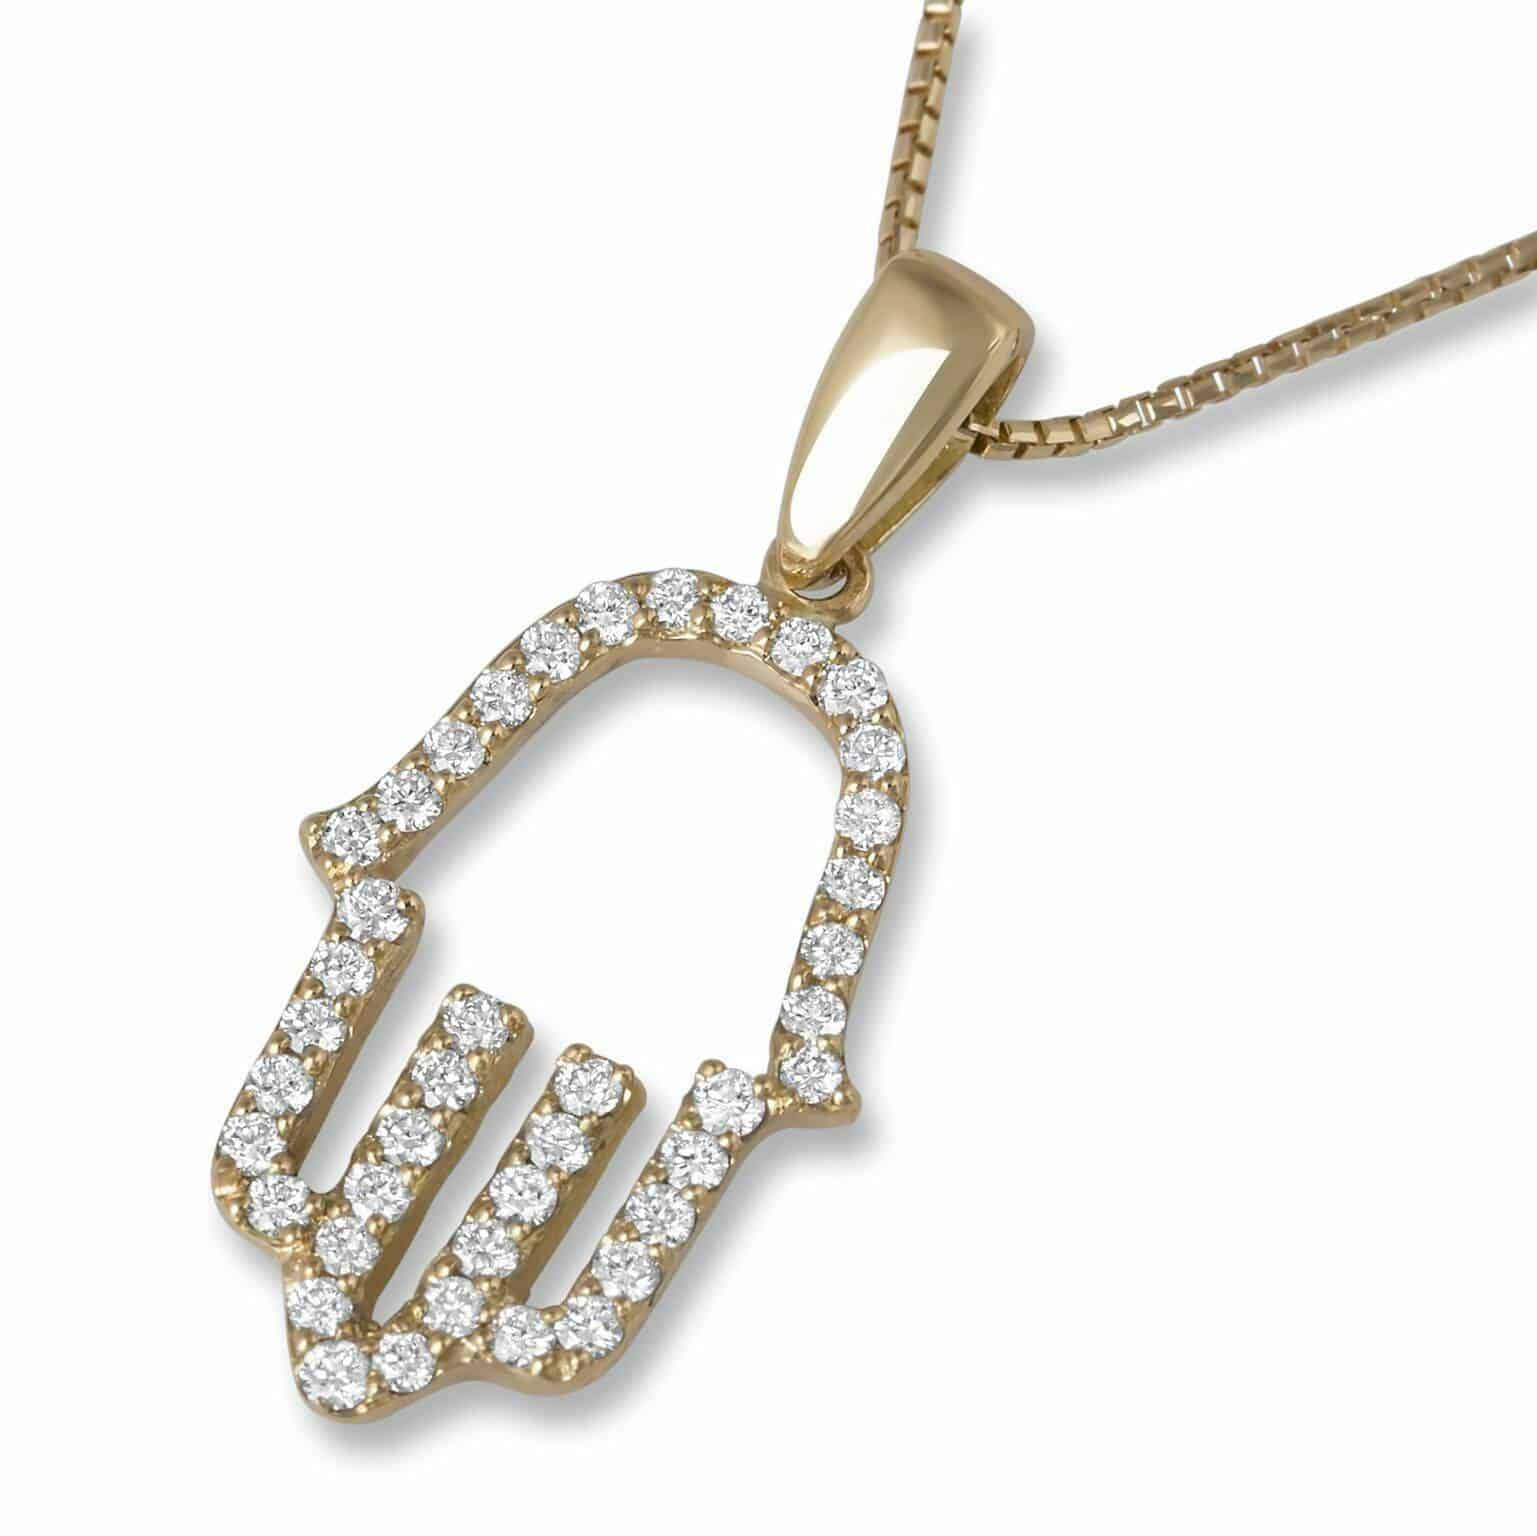 18K Gold Hamsa Pendant with Diamonds